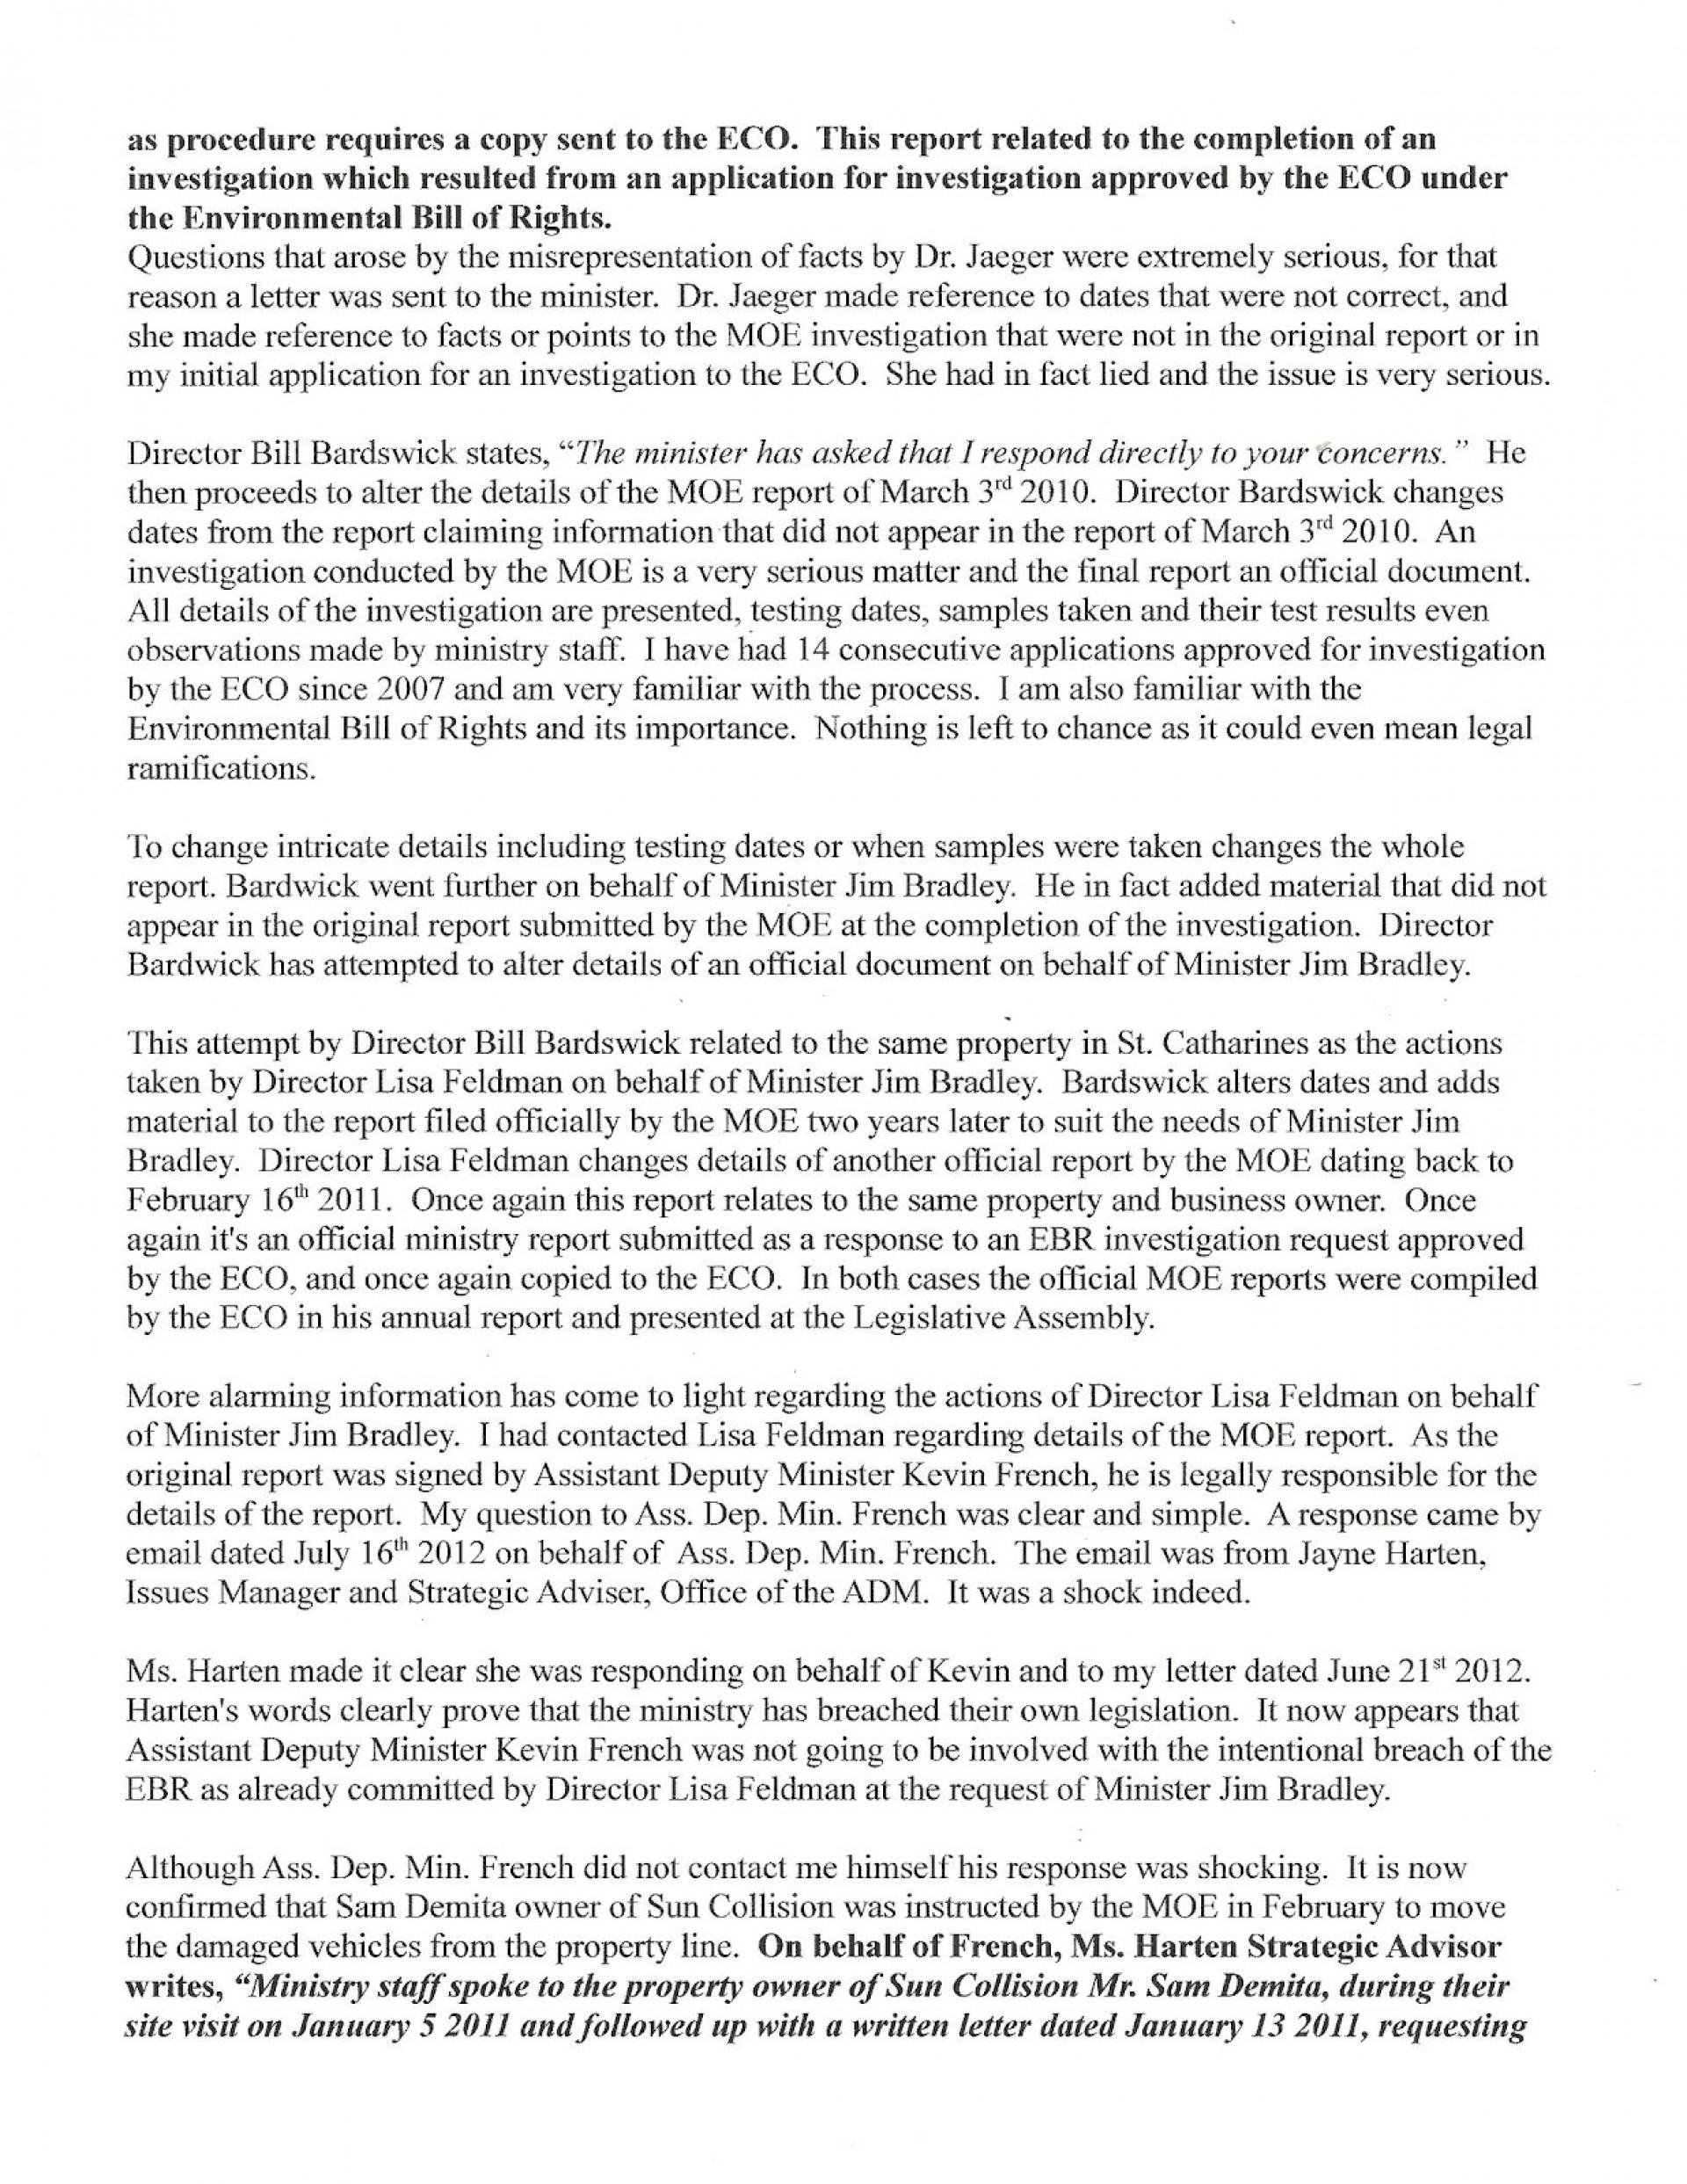 016 Ombudsmanletter2 Essay Example National Honor Society Sensational Application Examples Service Junior Scholarship 1920